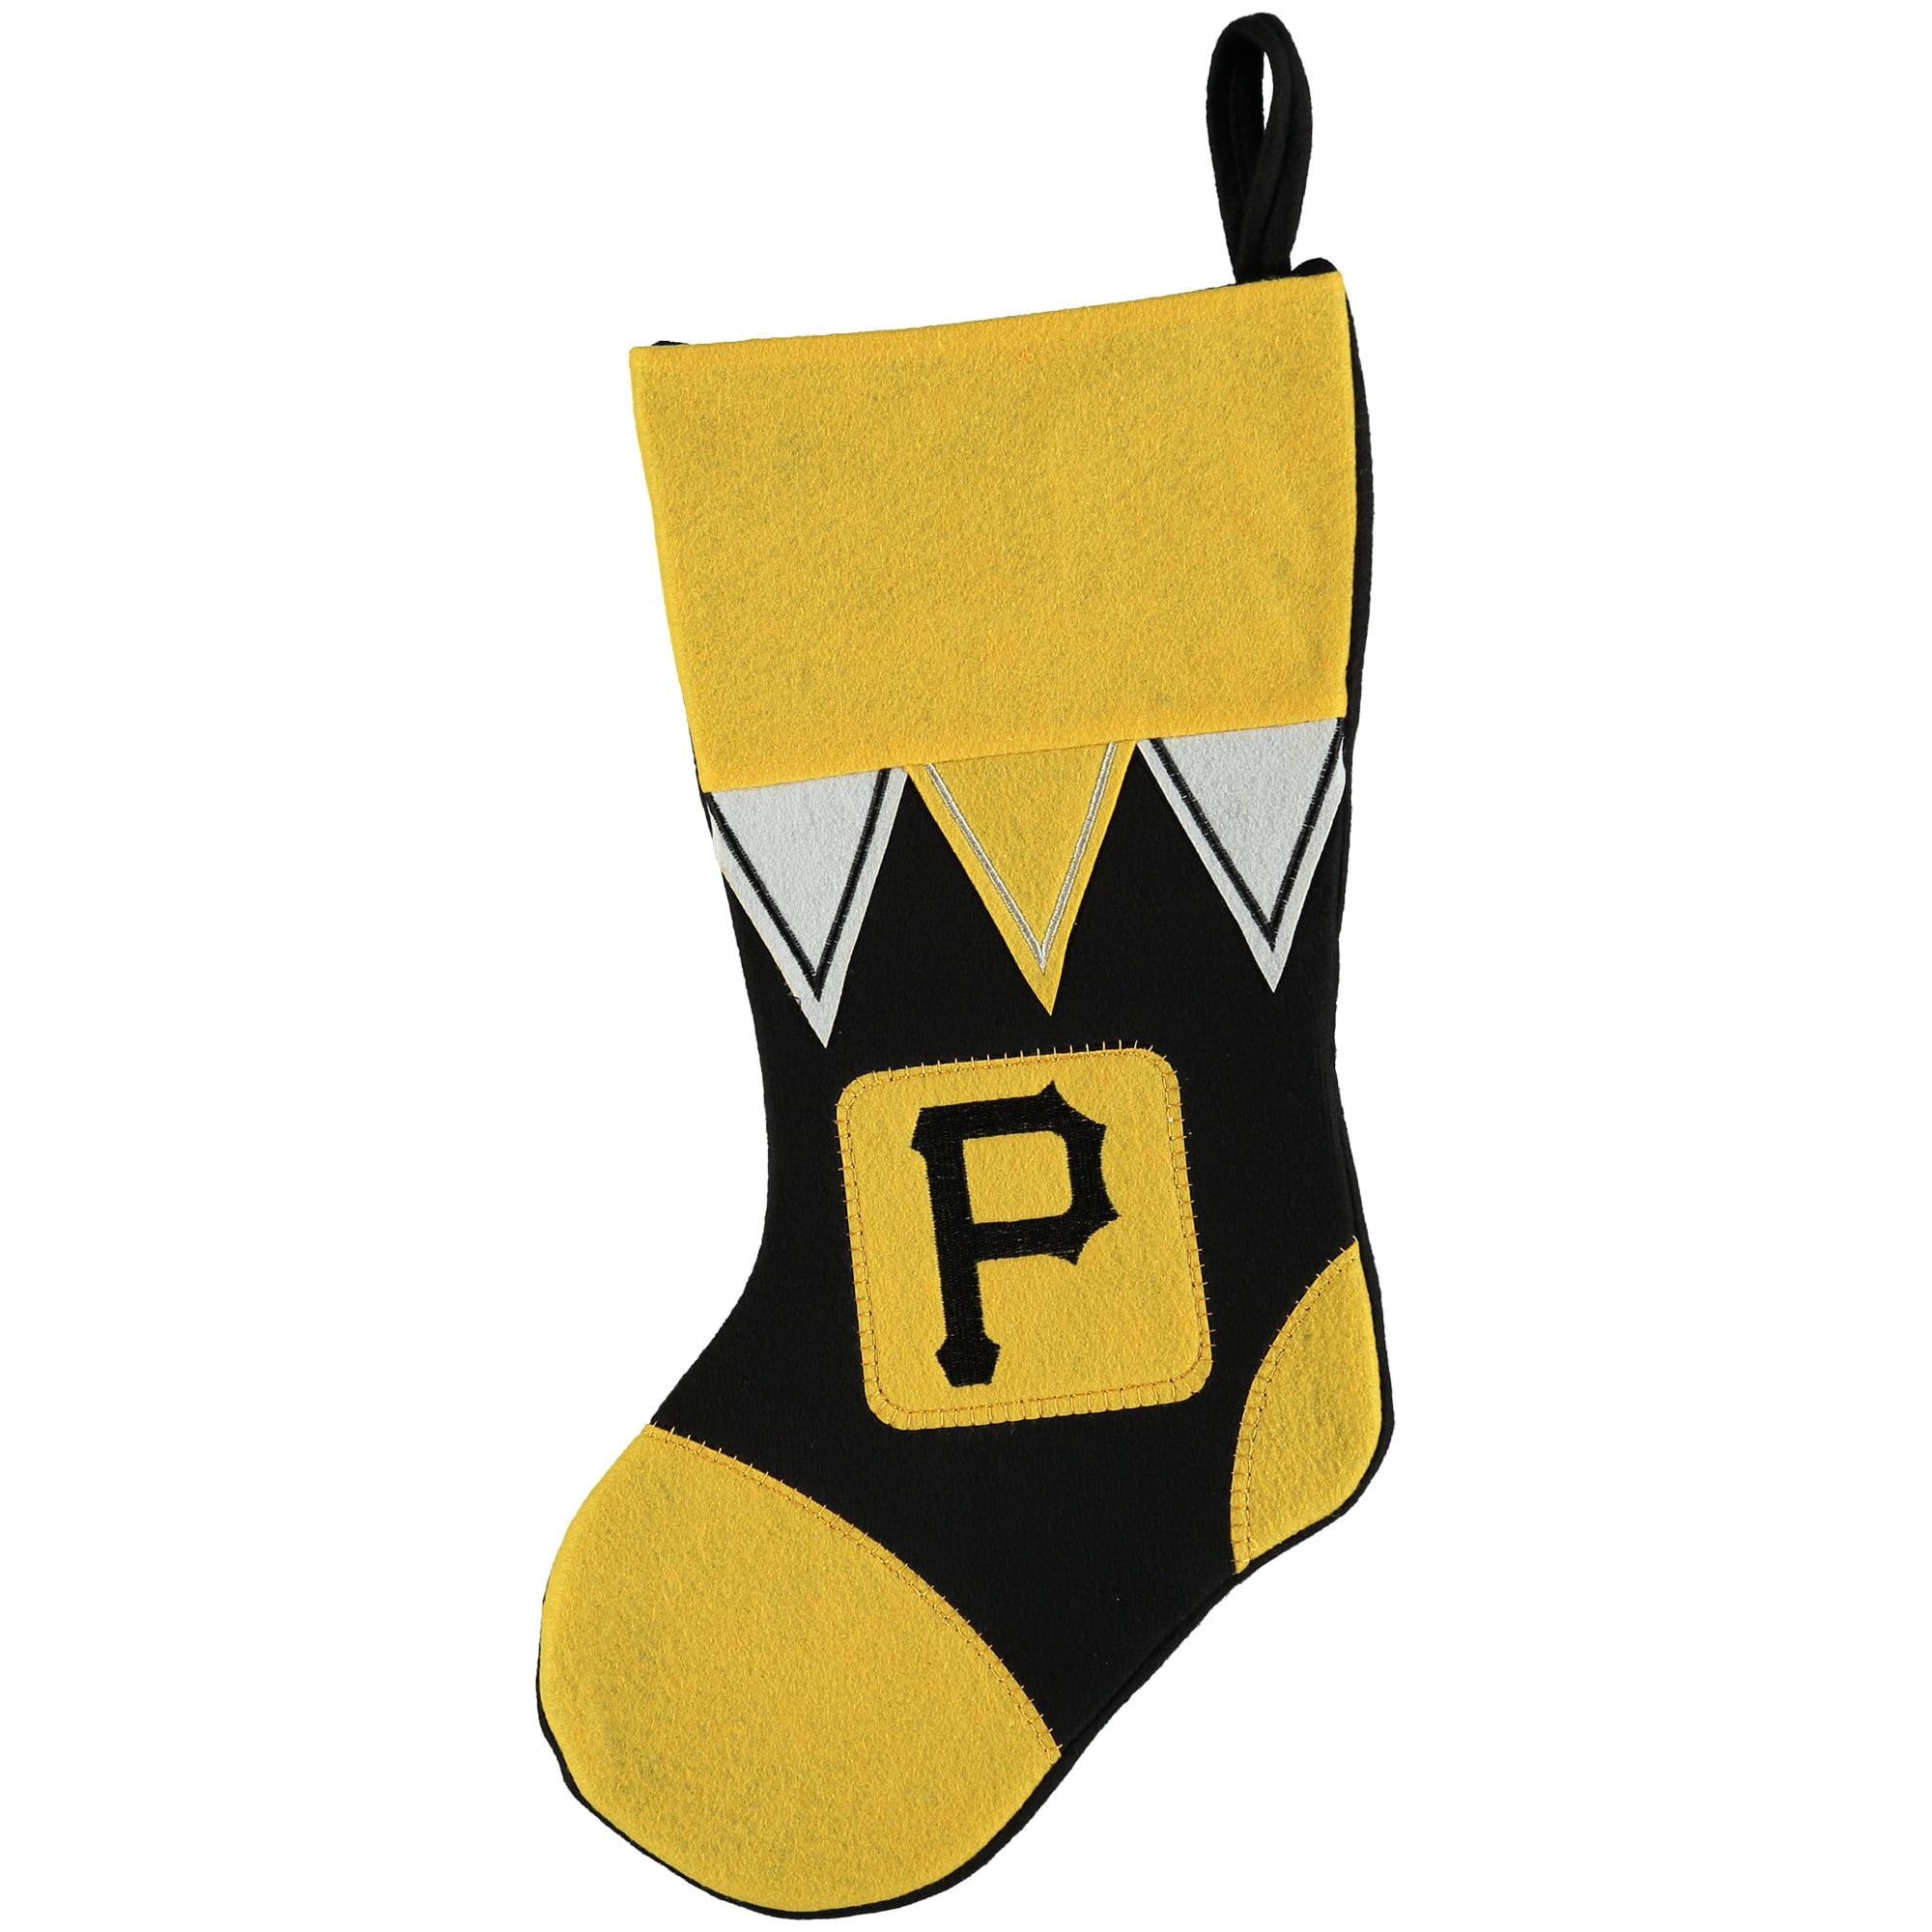 Pittsburgh Pirates Pennant Cuff Stocking - No Size